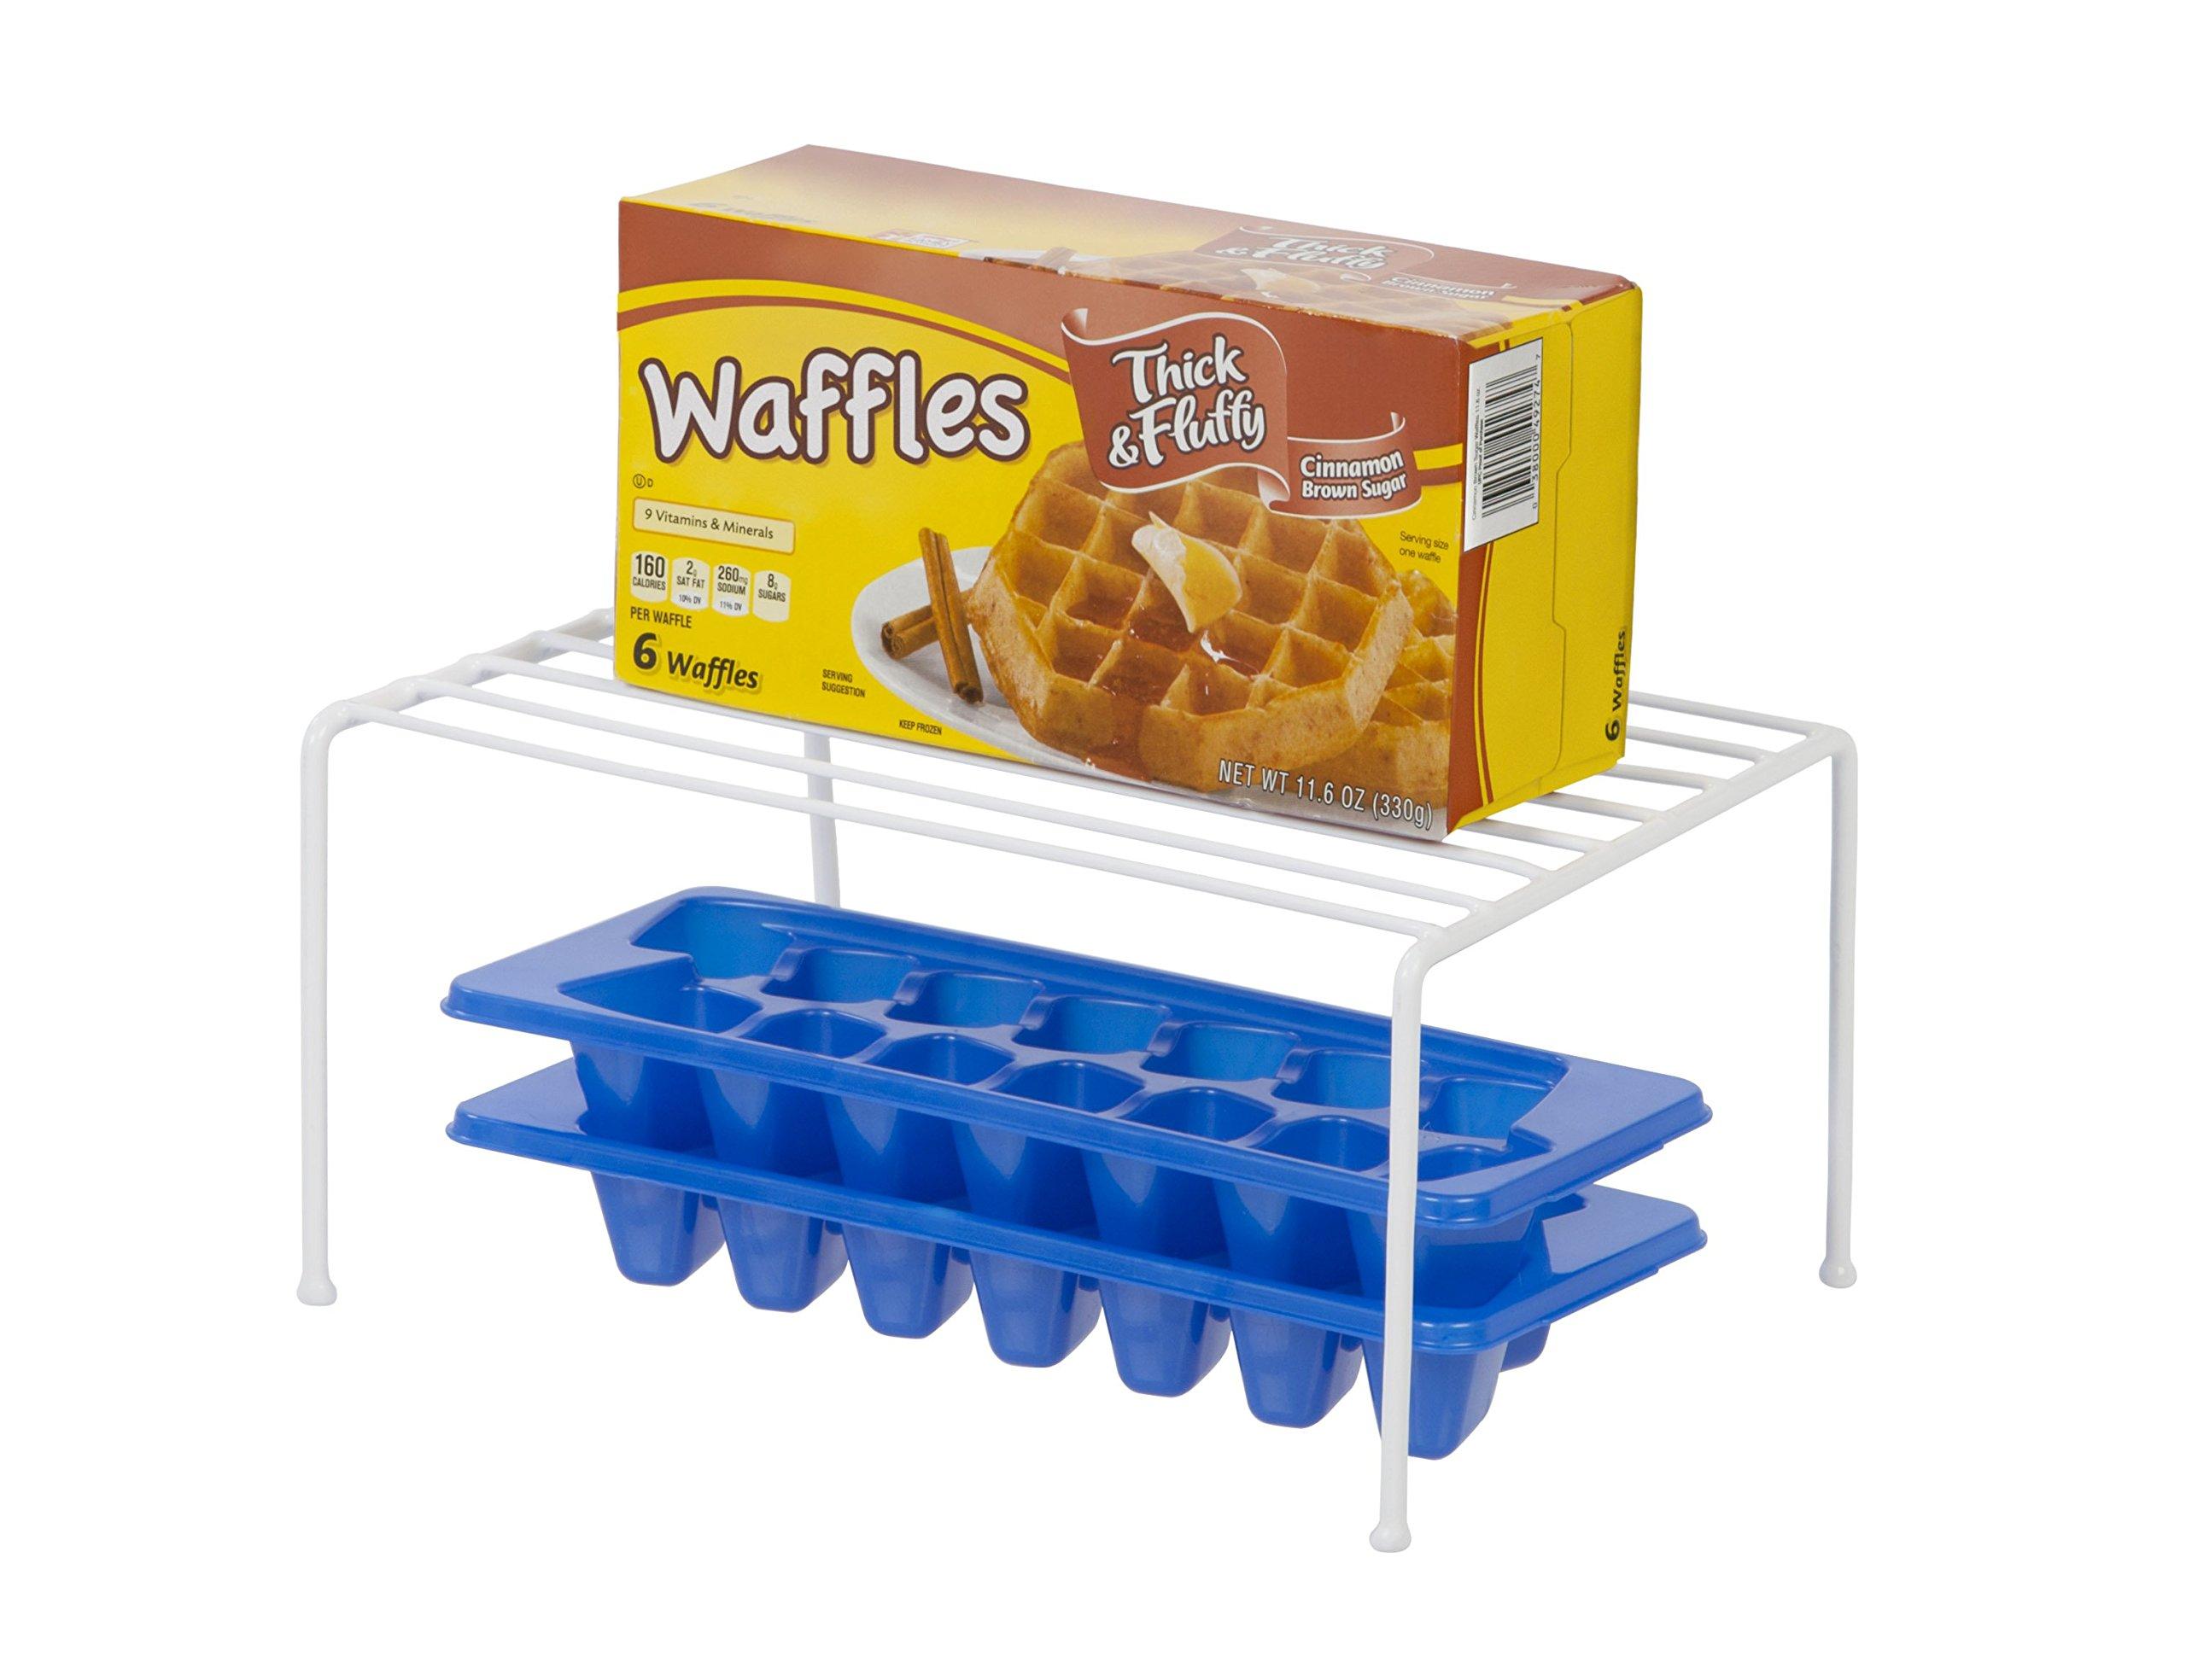 IRIS Fridge/Freezer Helper Shelf, White